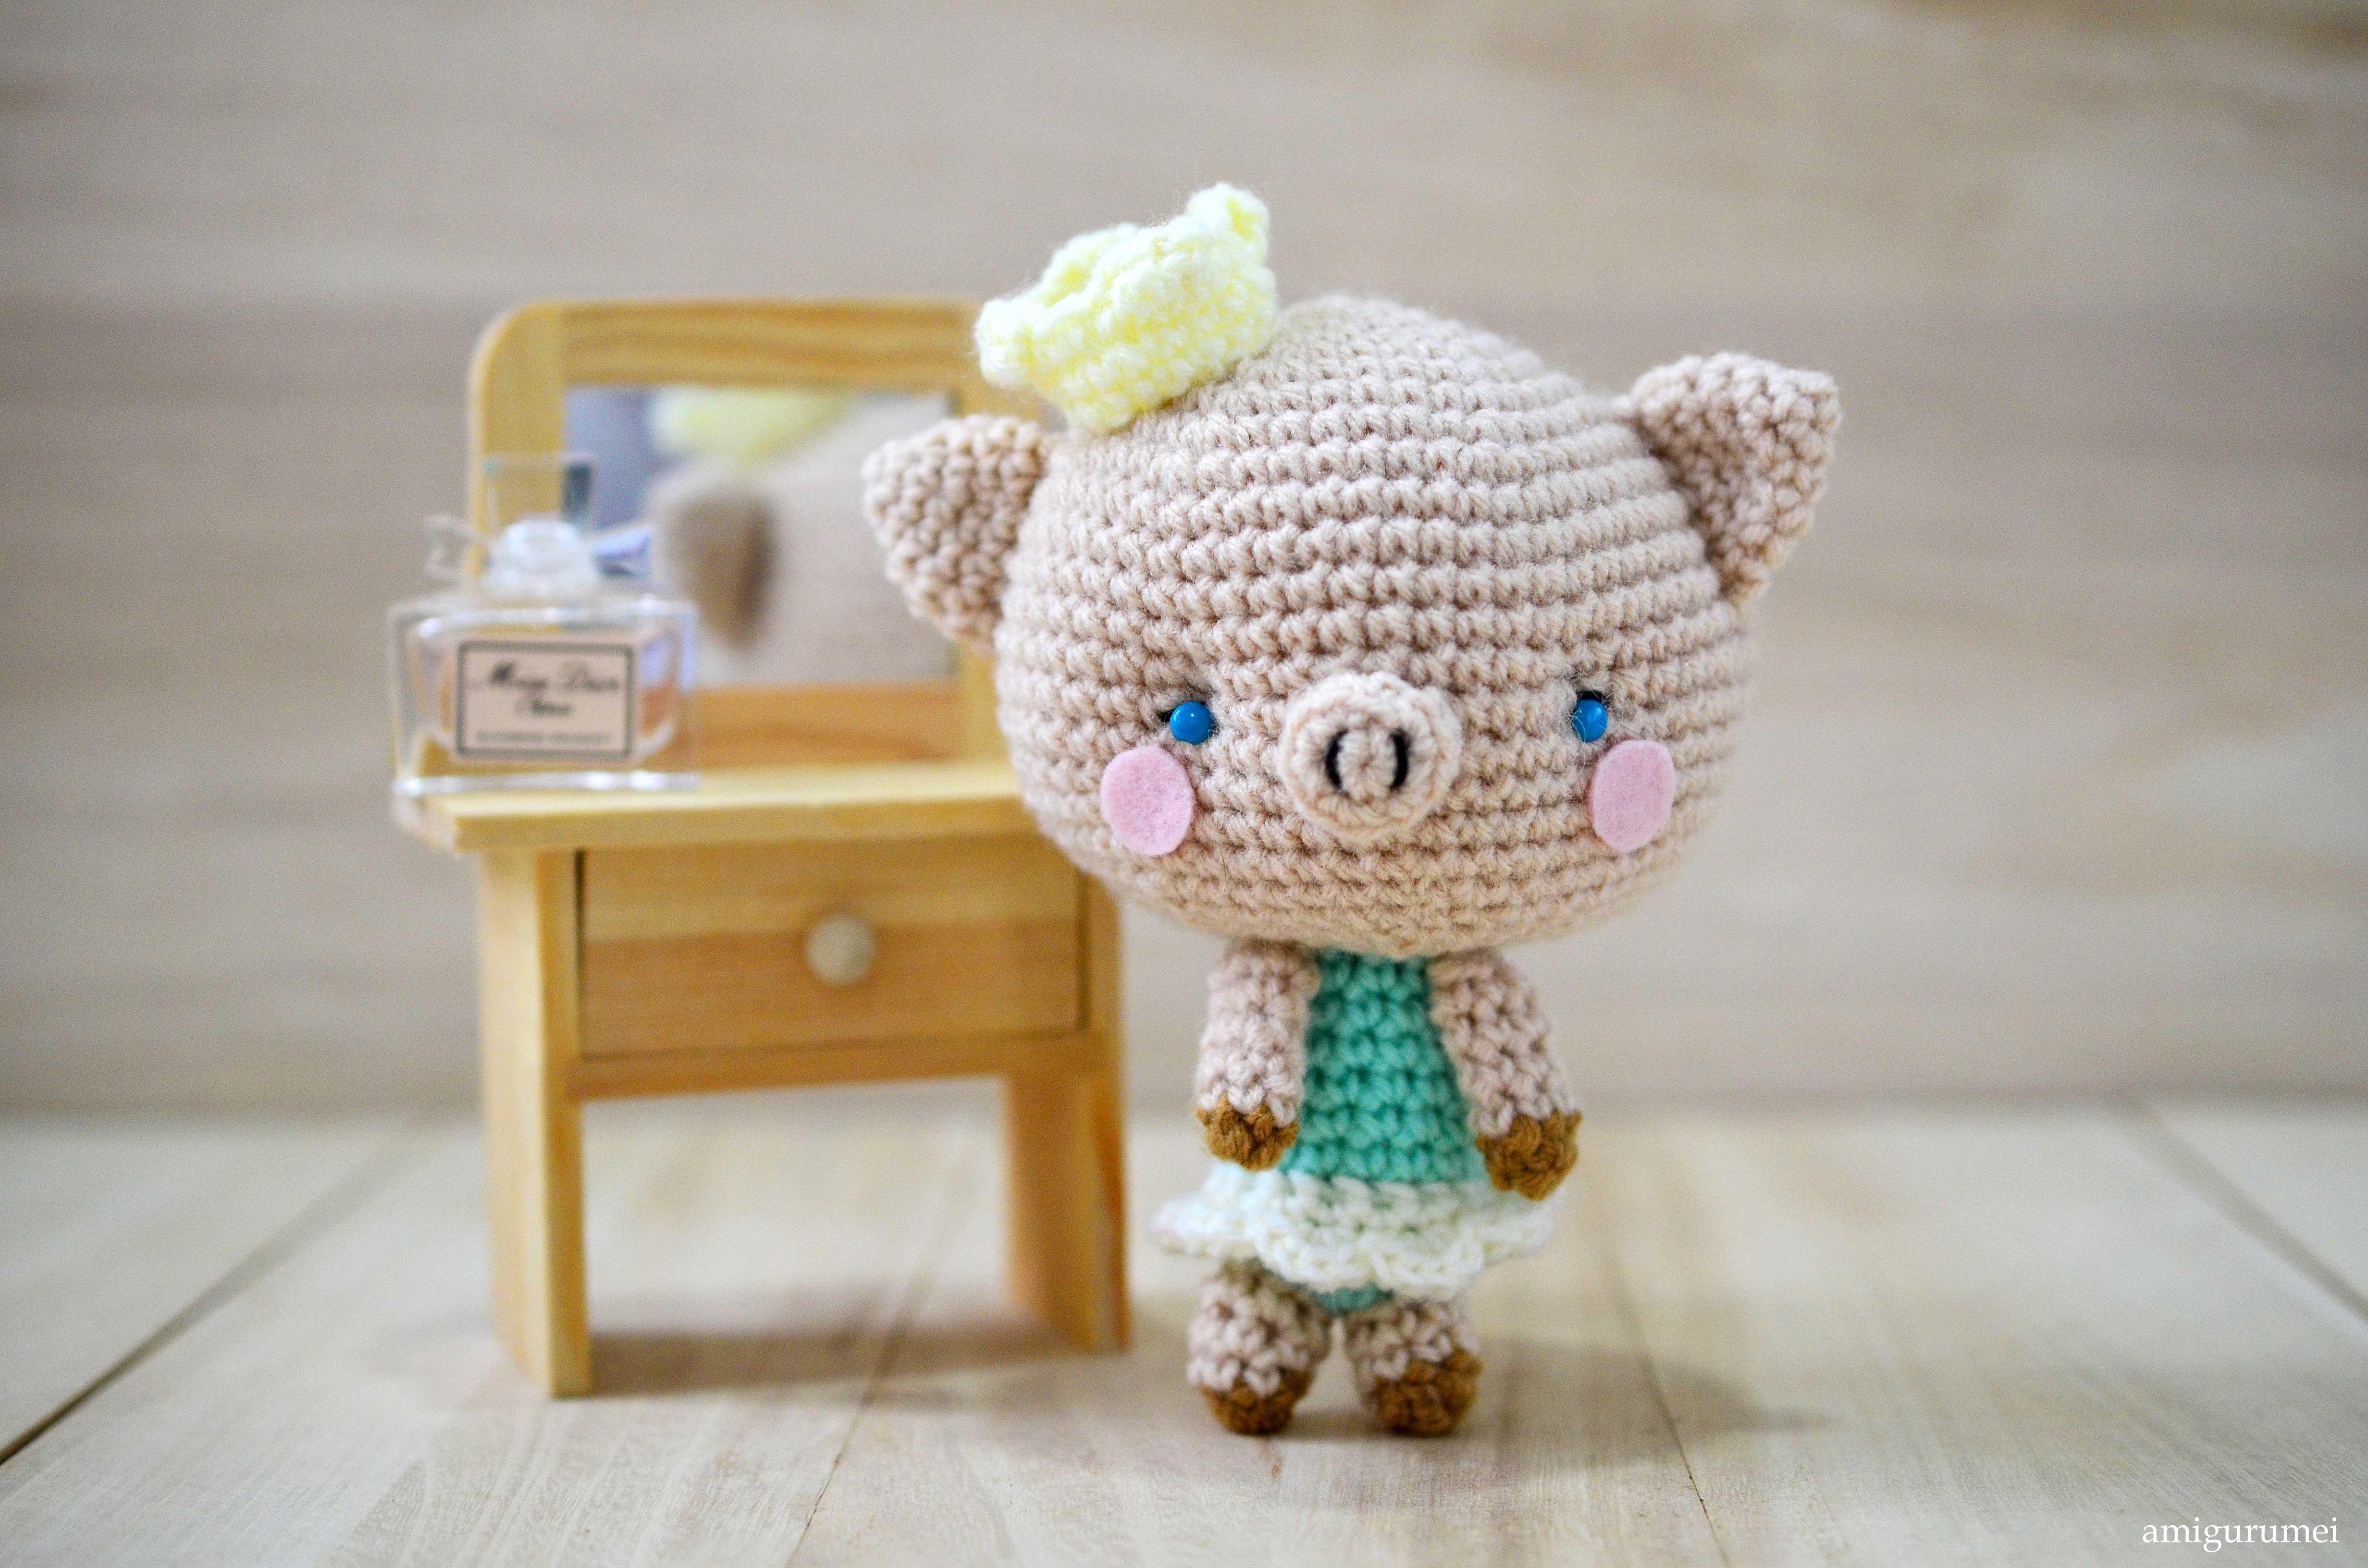 Free Kawaii Amigurumi Patterns : Free amigurumi pattern princess p amigurumei あみぐるメイ